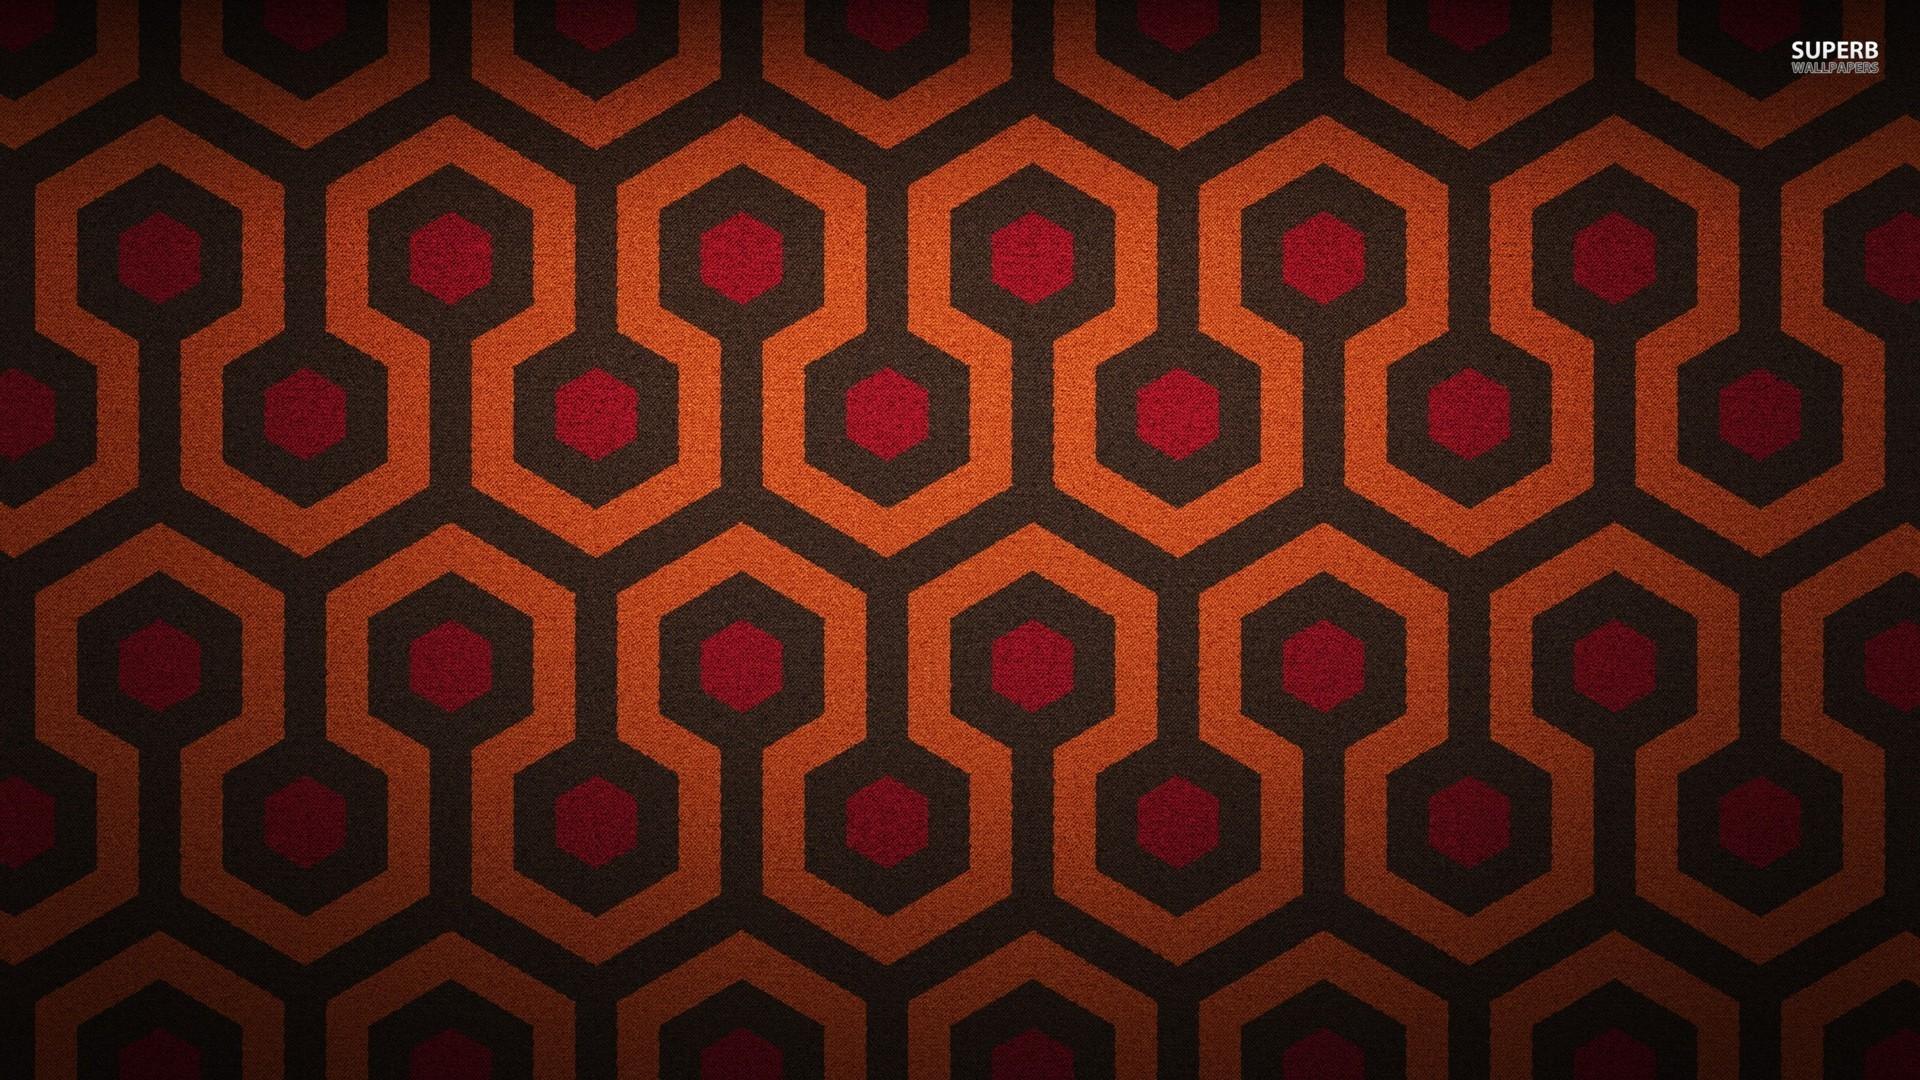 1920%C3%971080-wallpaper-wpc580554